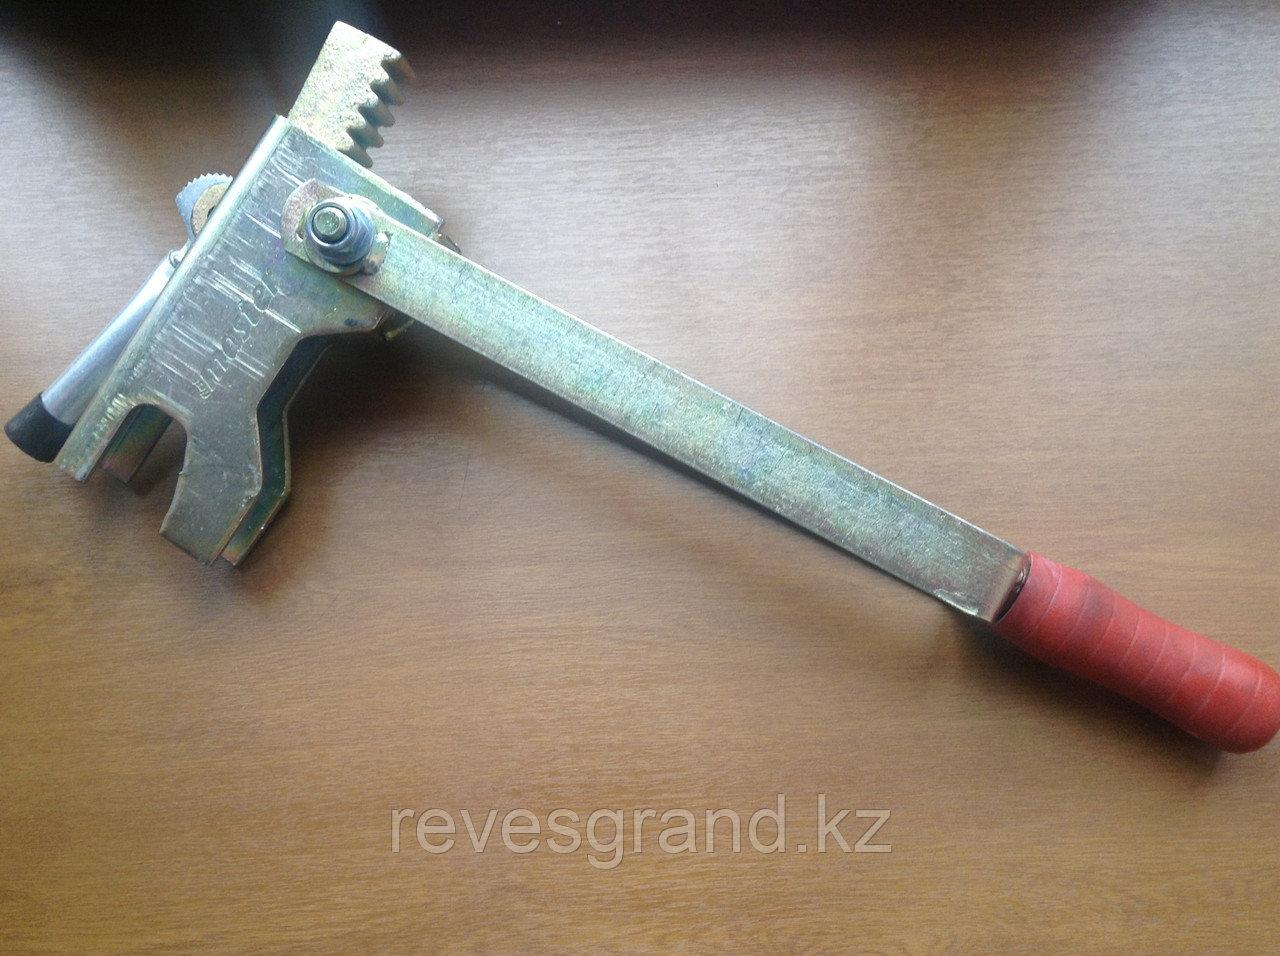 Ключ для чироз (большой) - фото 1